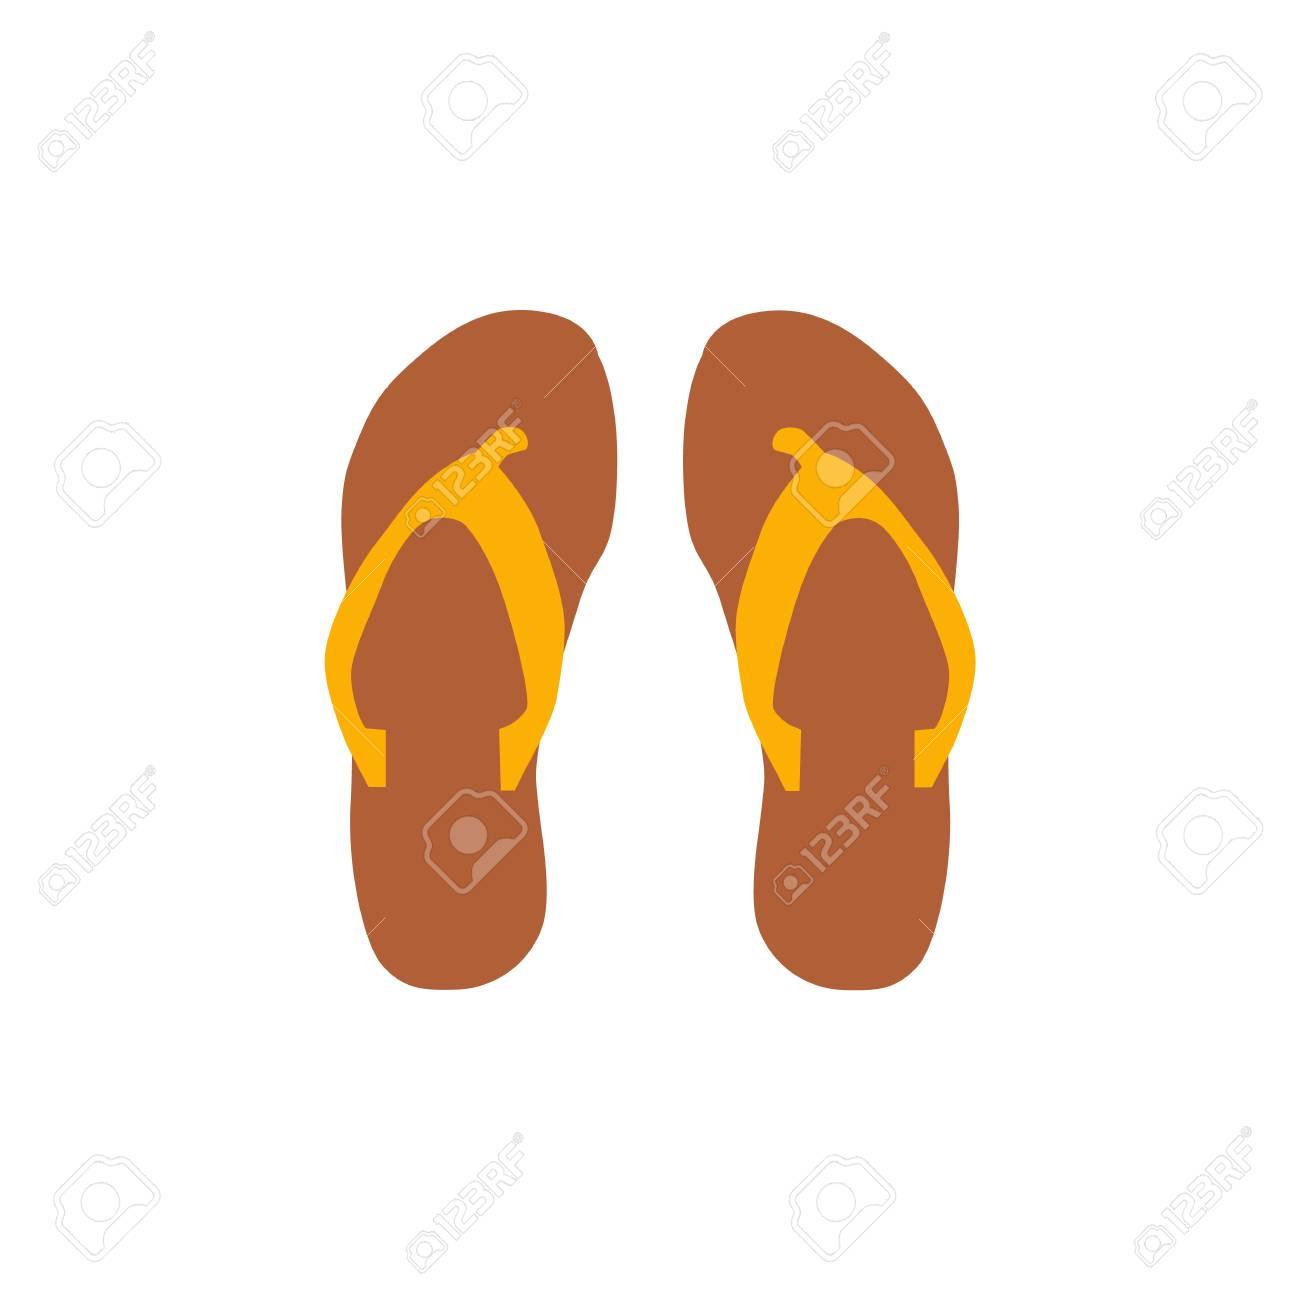 46dfdde0ef7601 Beach slippers icon vector illustration Beach slippers icon isolated. Beach  slippers summer symbol. Beach